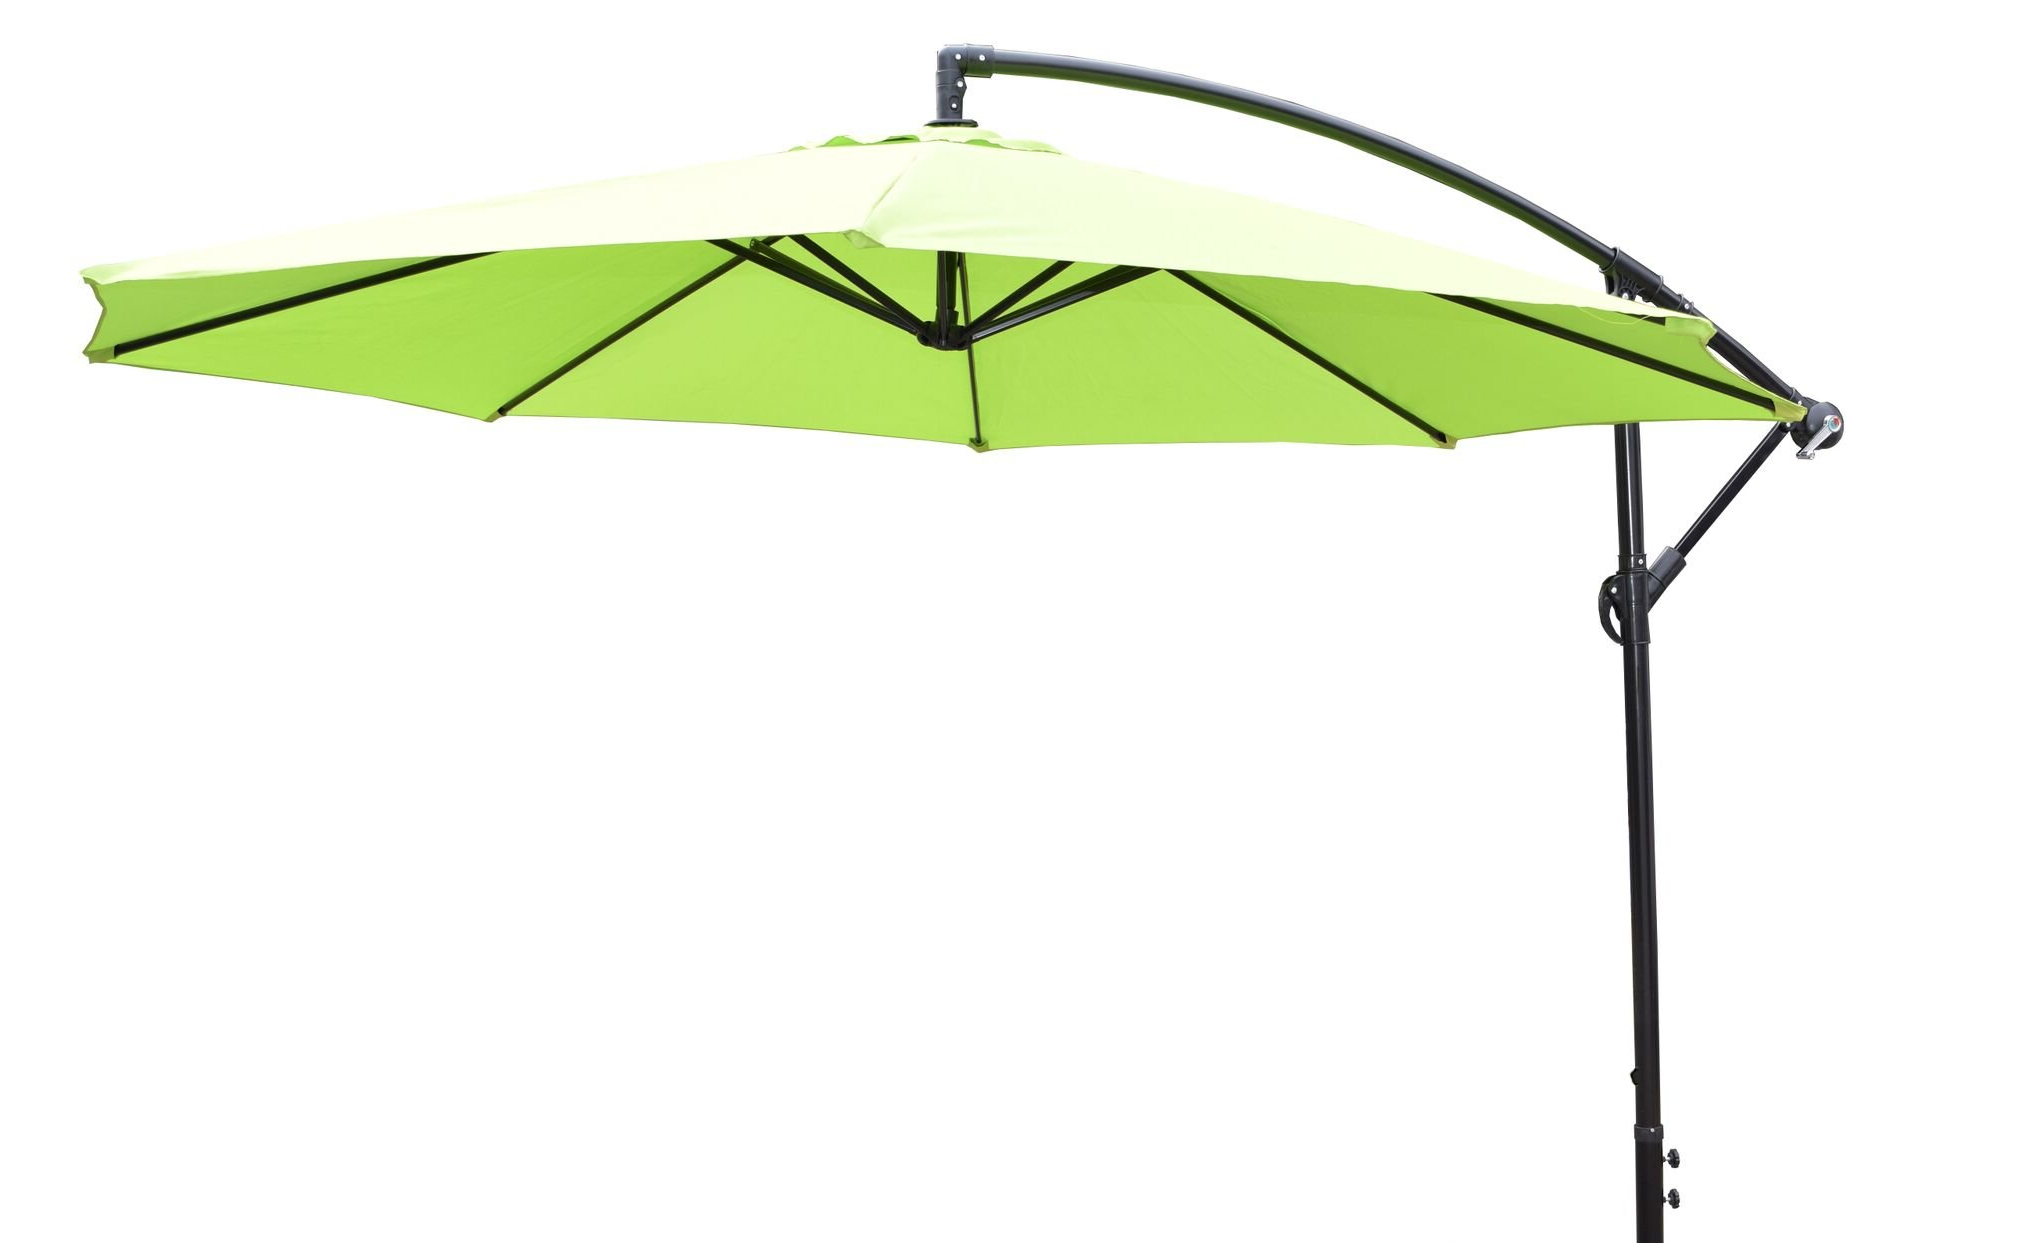 Auda 10' Cantilever Umbrella In 2019 Nasiba Square Cantilever Sunbrella Umbrellas (View 9 of 20)